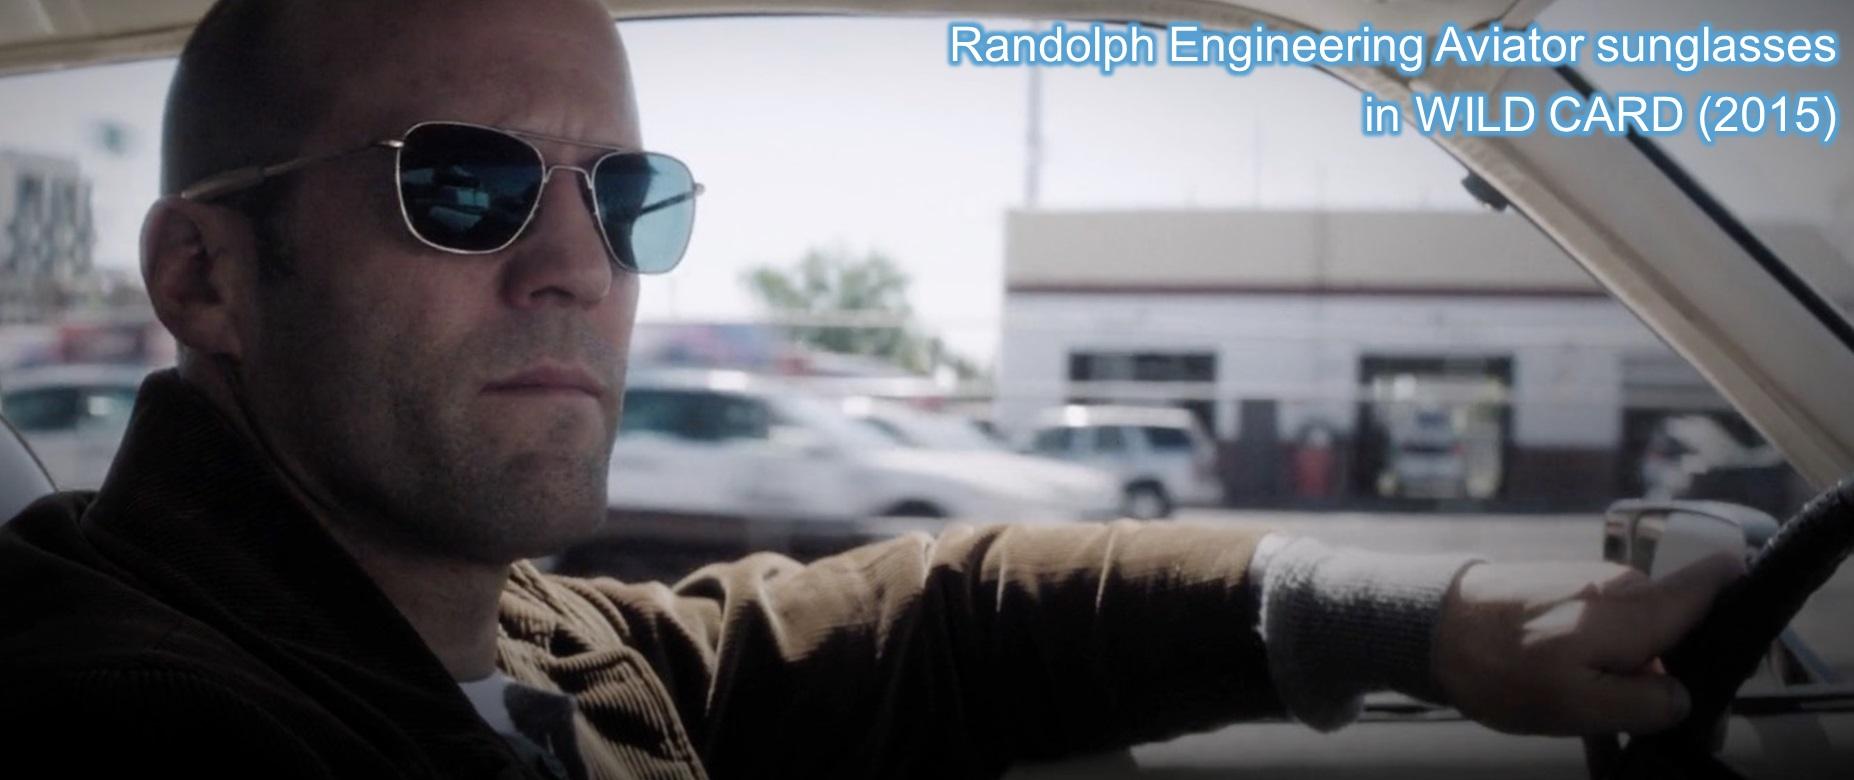 Randolp Engineering aviator sunglasses in wild card jason statham